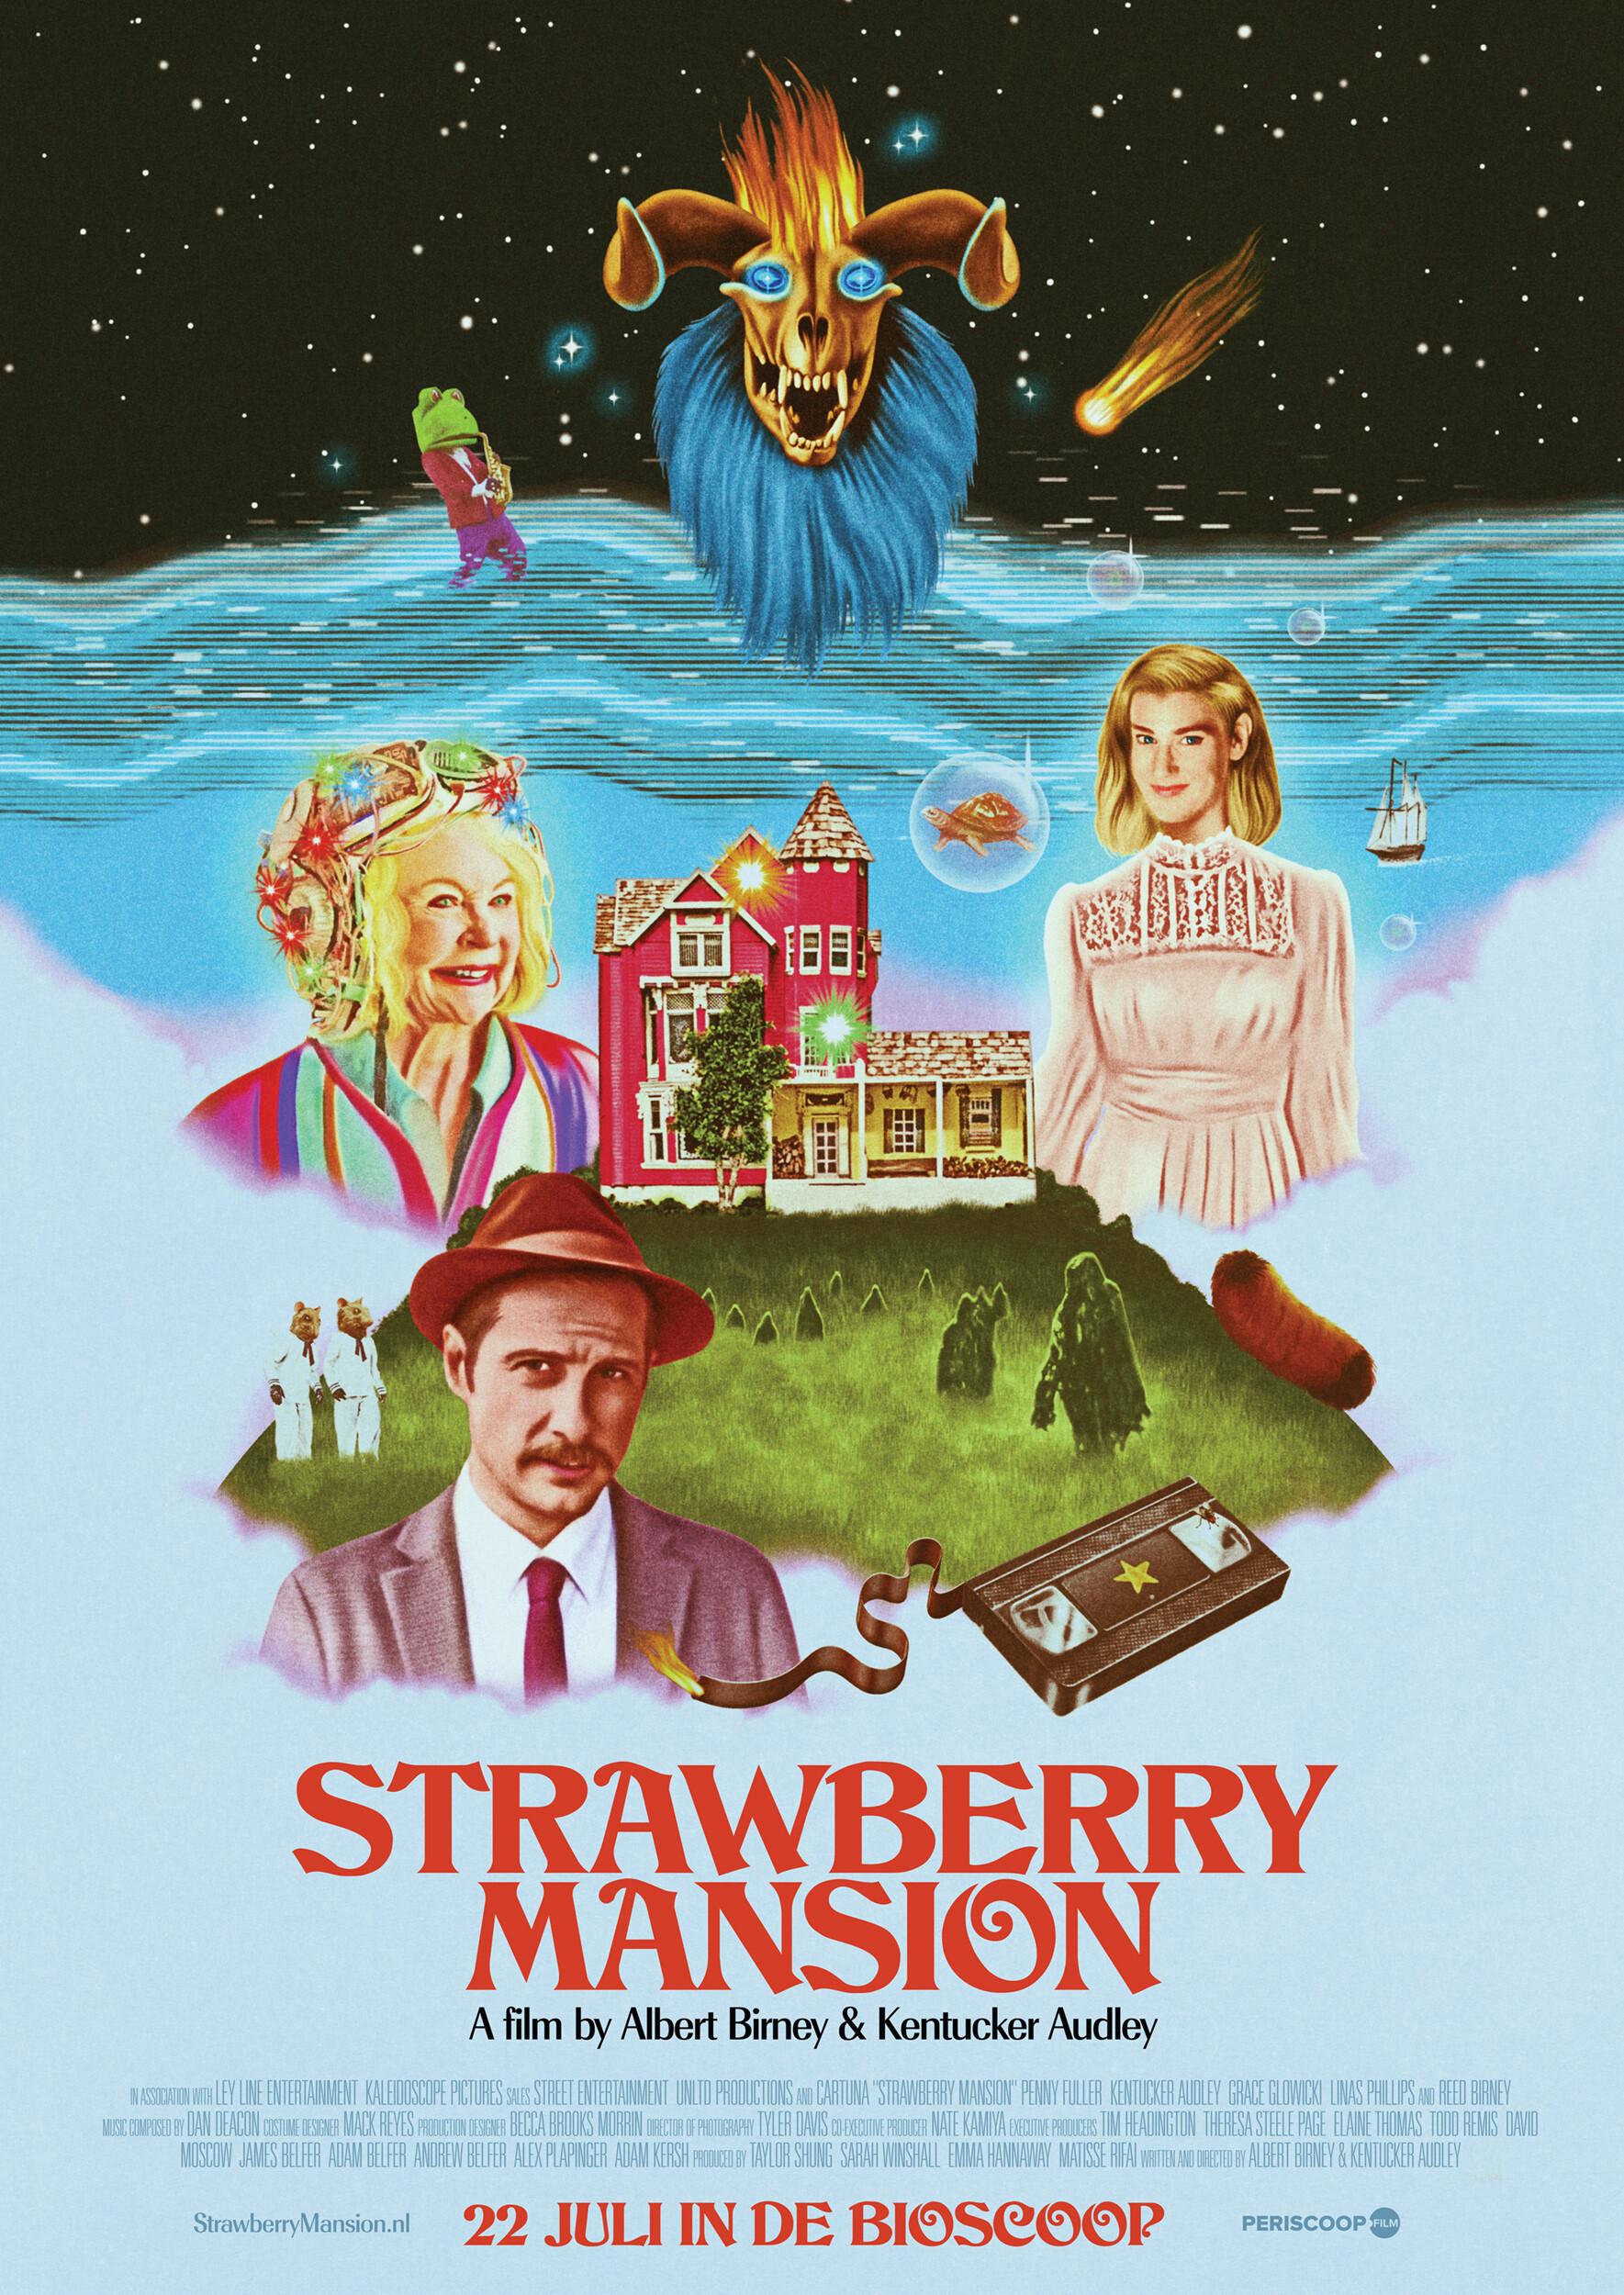 Strawberry mantion